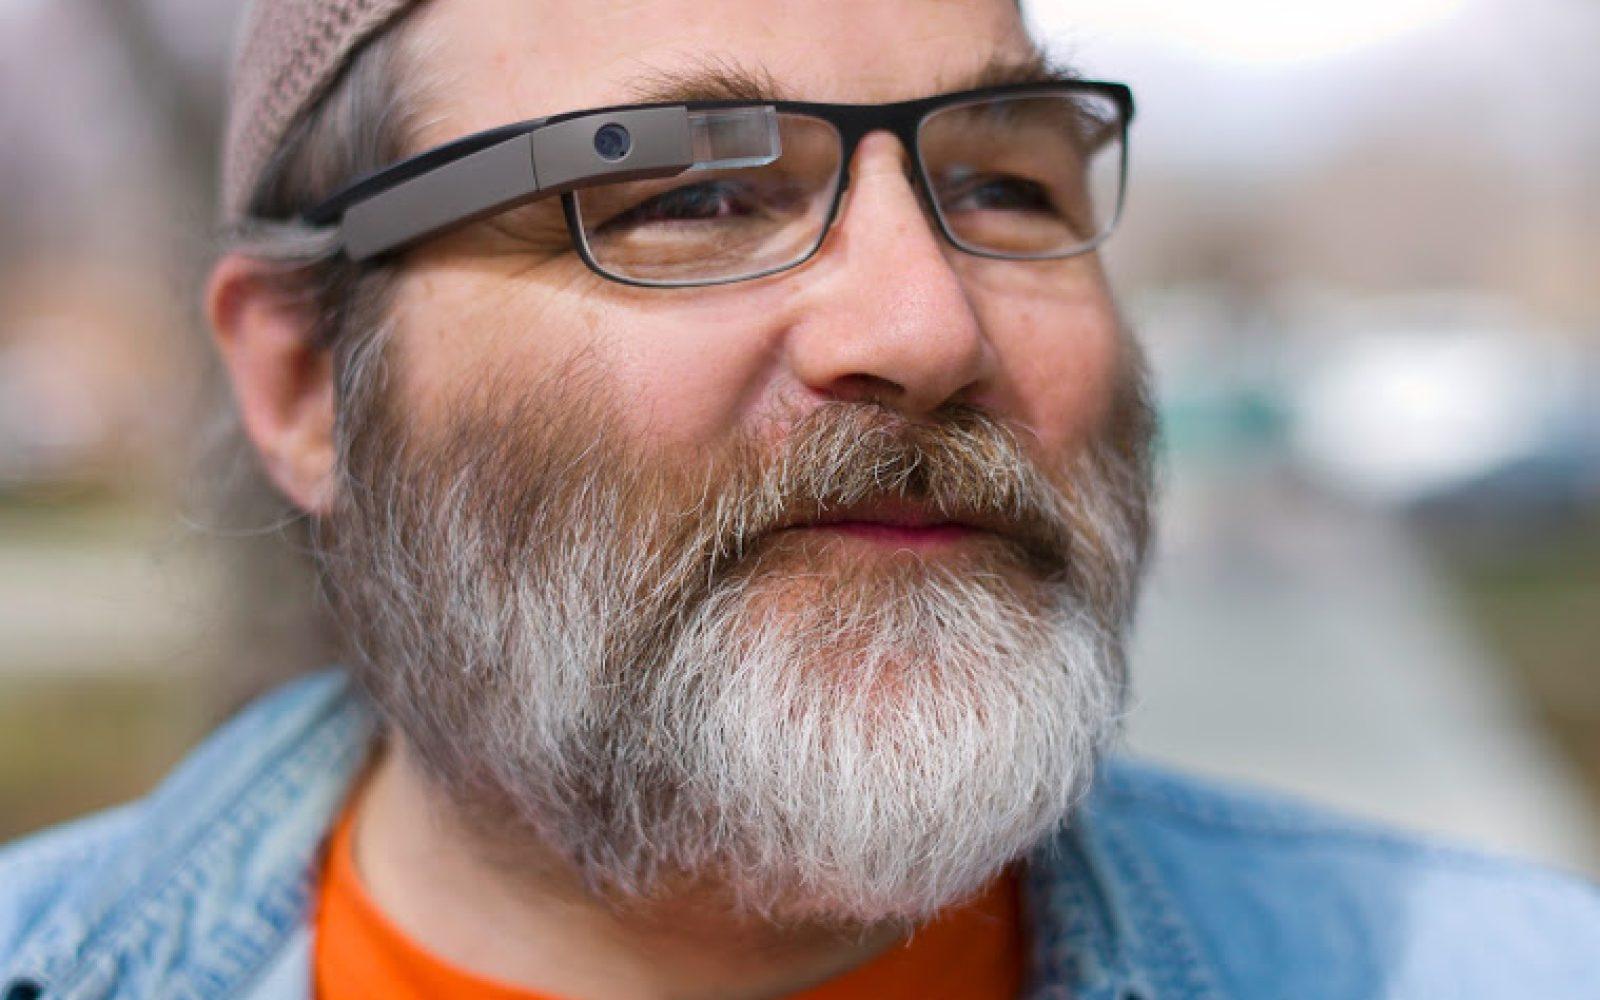 a213f242600 Google confirms prescription frames   lenses in the works for Google Glass